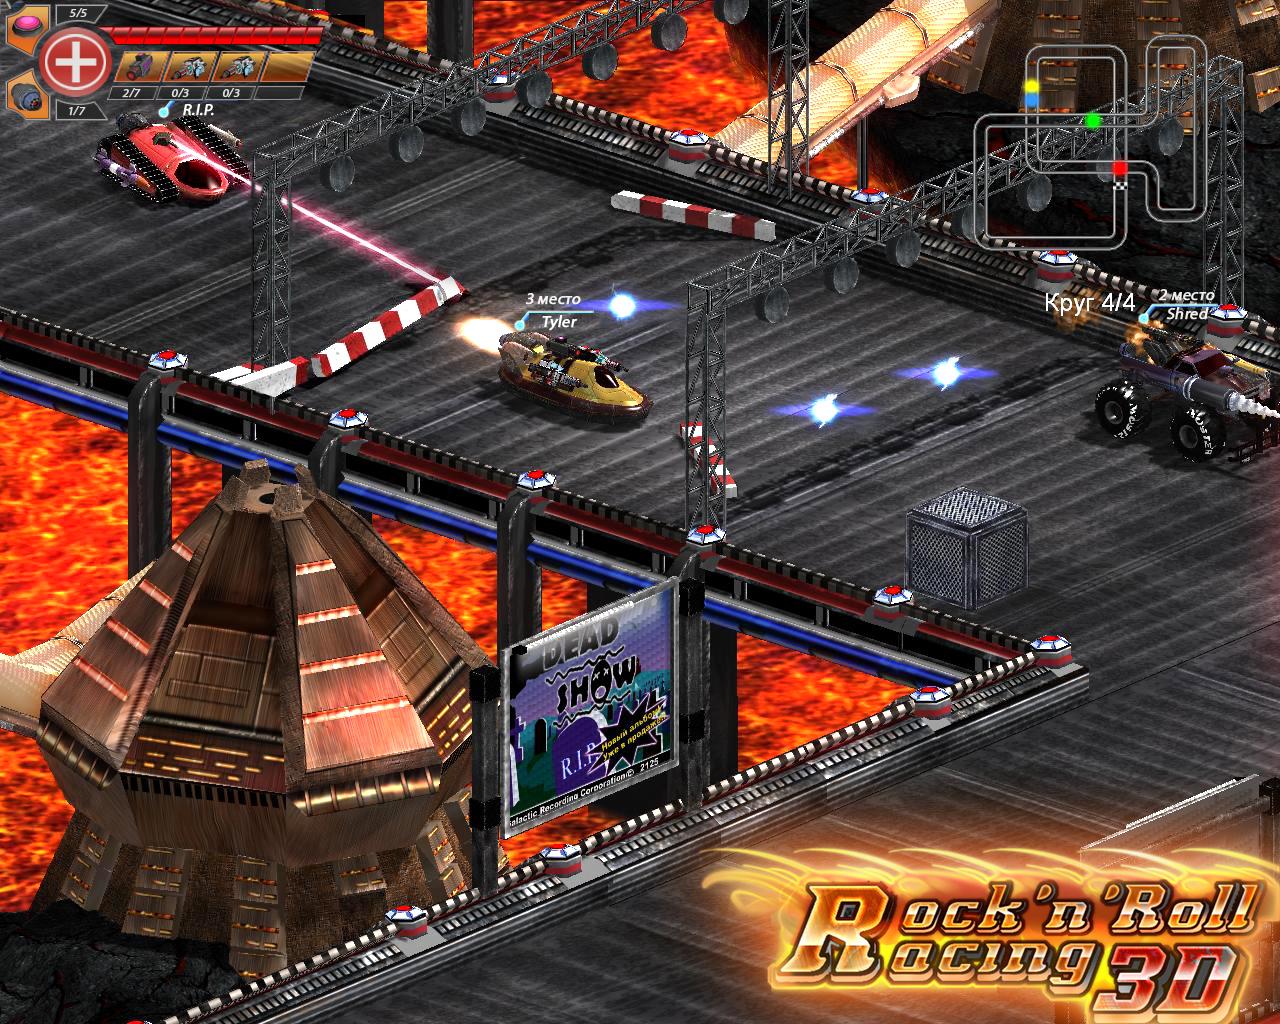 Rock n'Roll Racing 3D